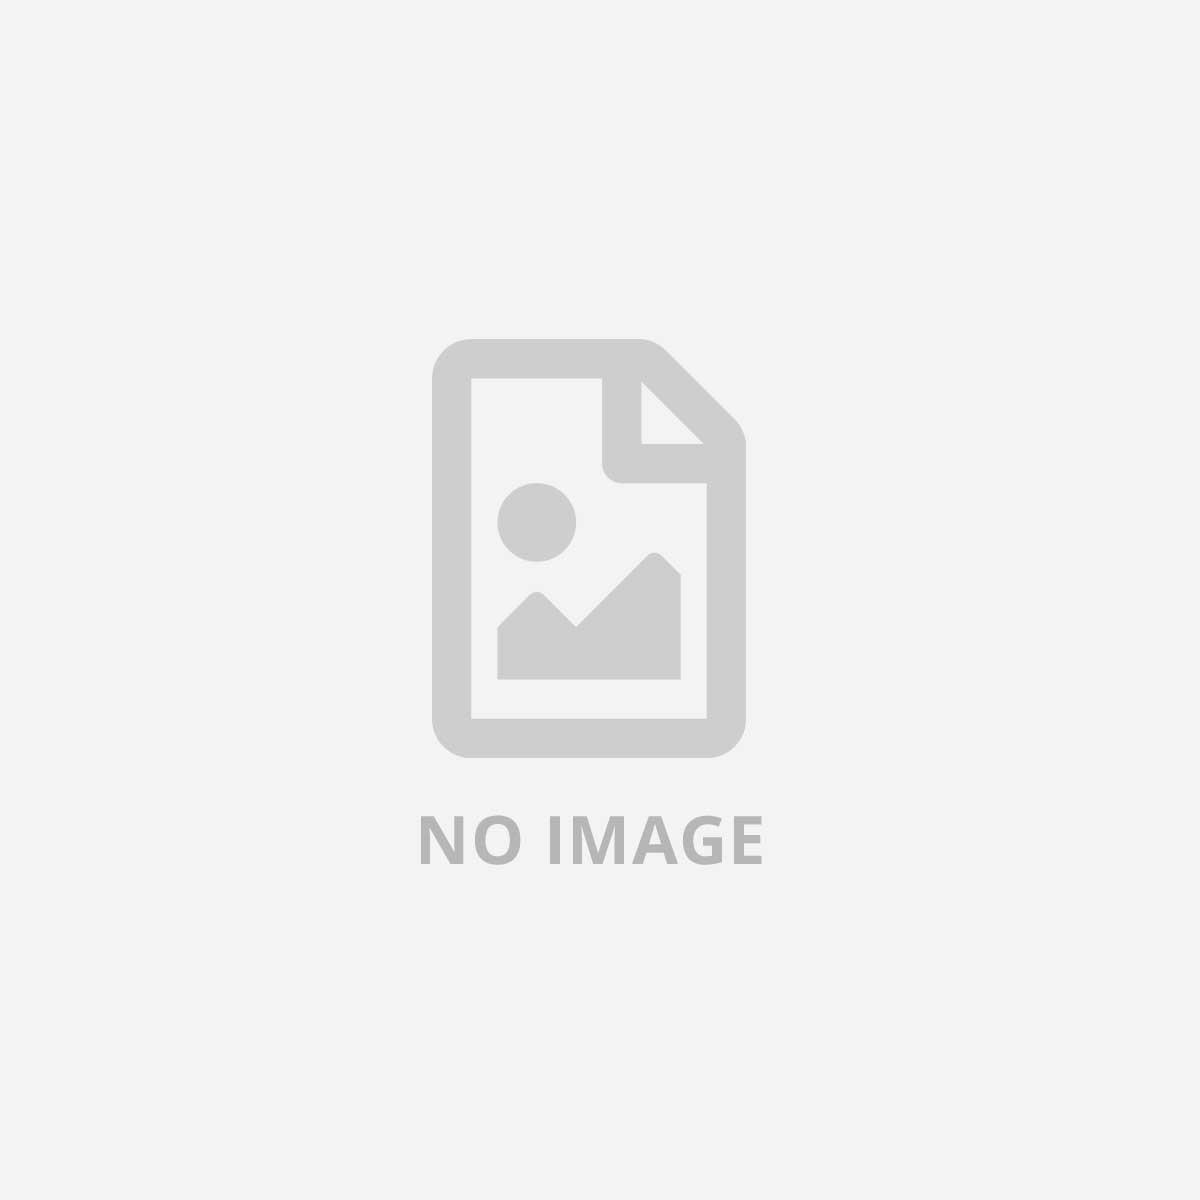 KENWOOD DASHCAM DRV-A100 TFT LCD FULL HD